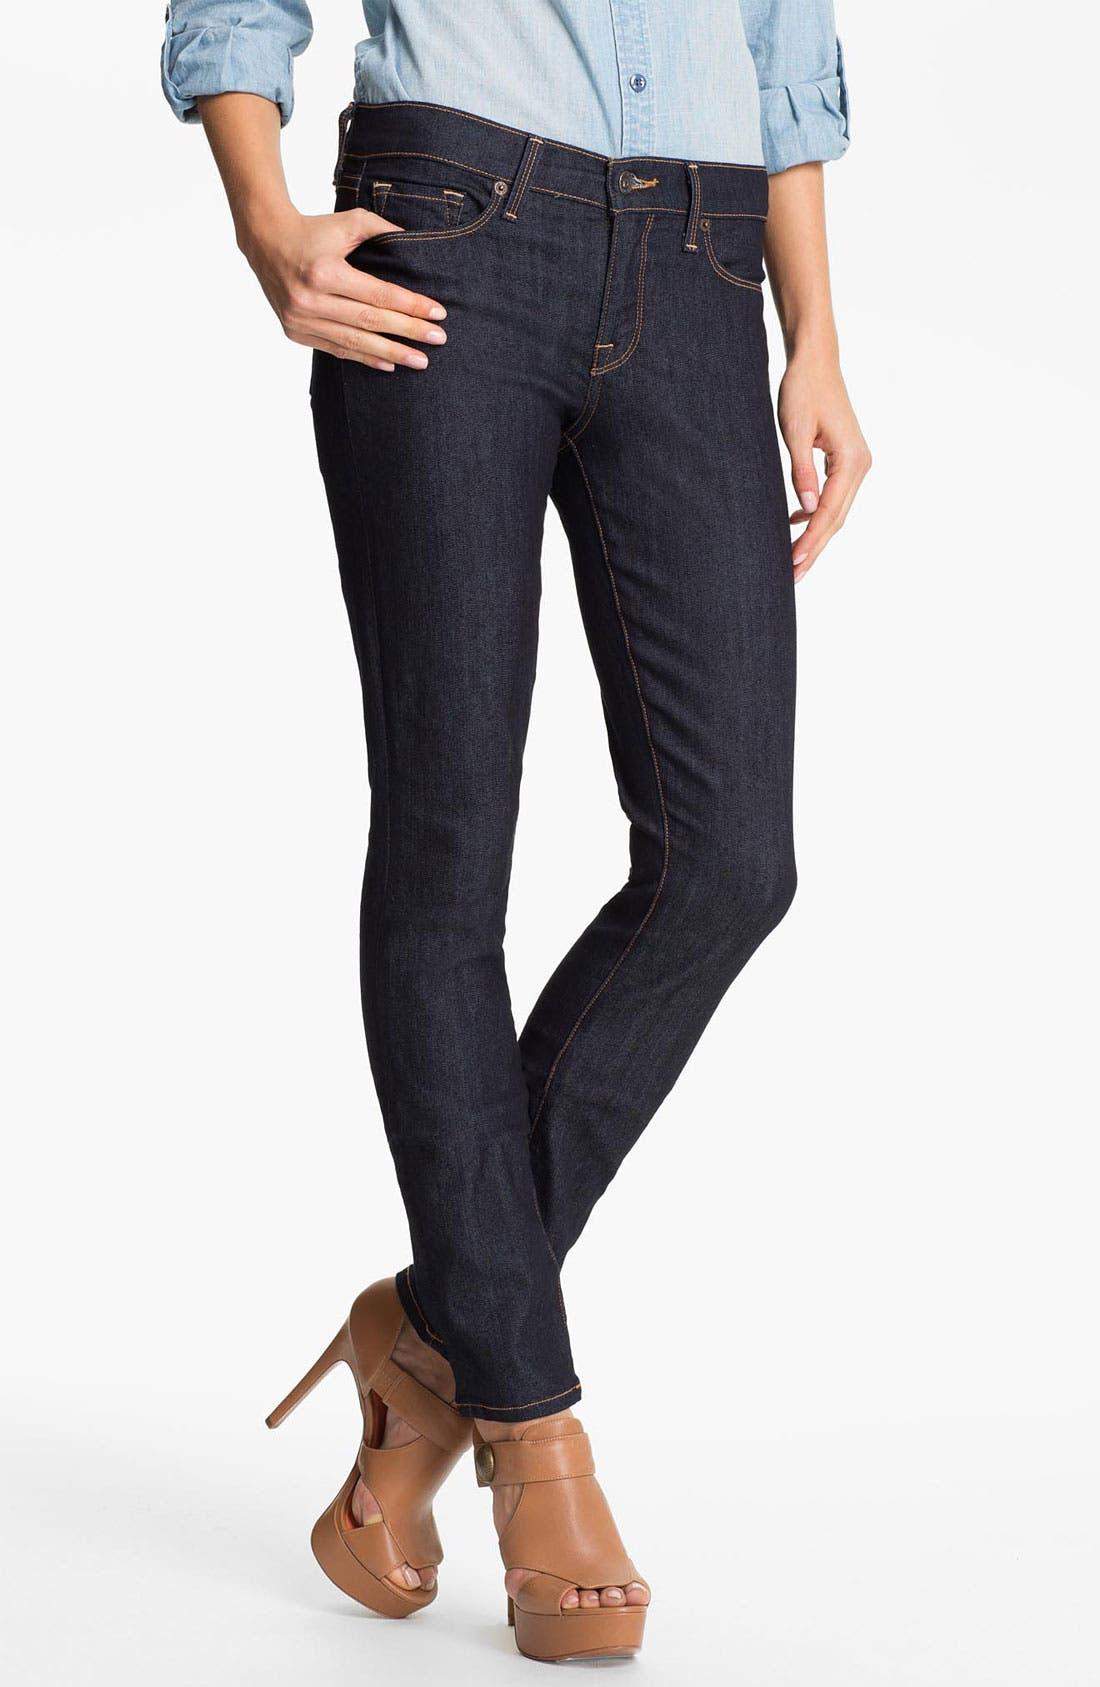 Main Image - Lucky Brand 'Sofia'  Skinny Jeans (Resin)